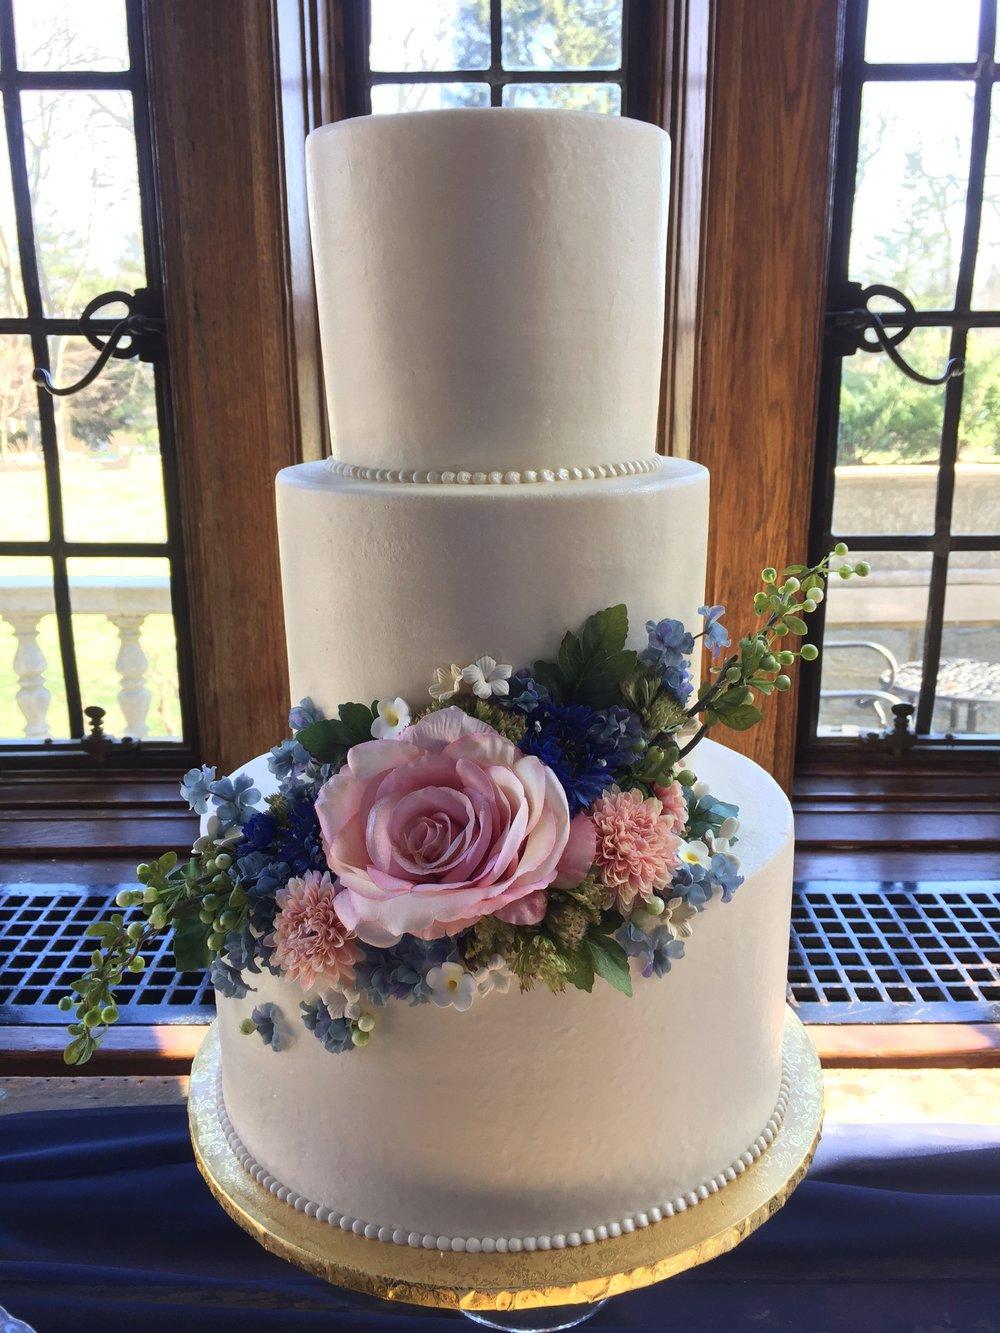 3 Layer, 3 Tier Wedding Cake